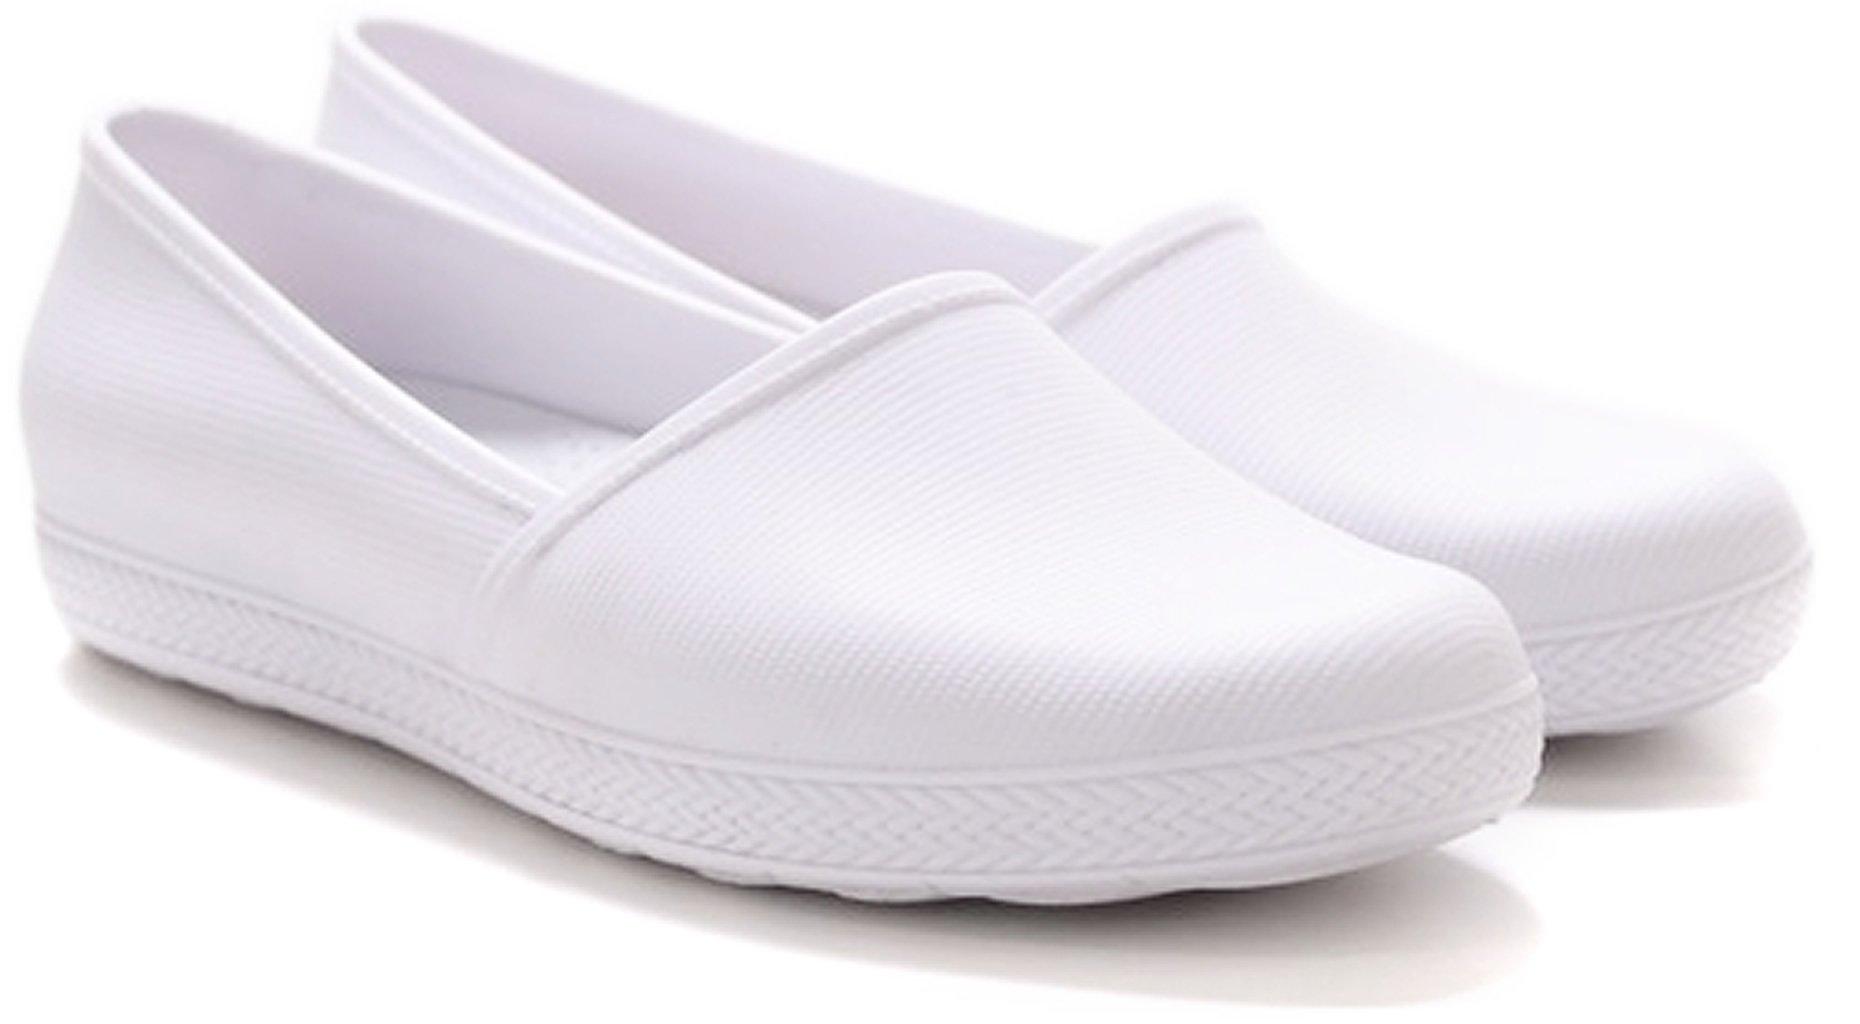 BOA ONDA Milena Women's Waterproof Flat - Keep Nursing (7, White)